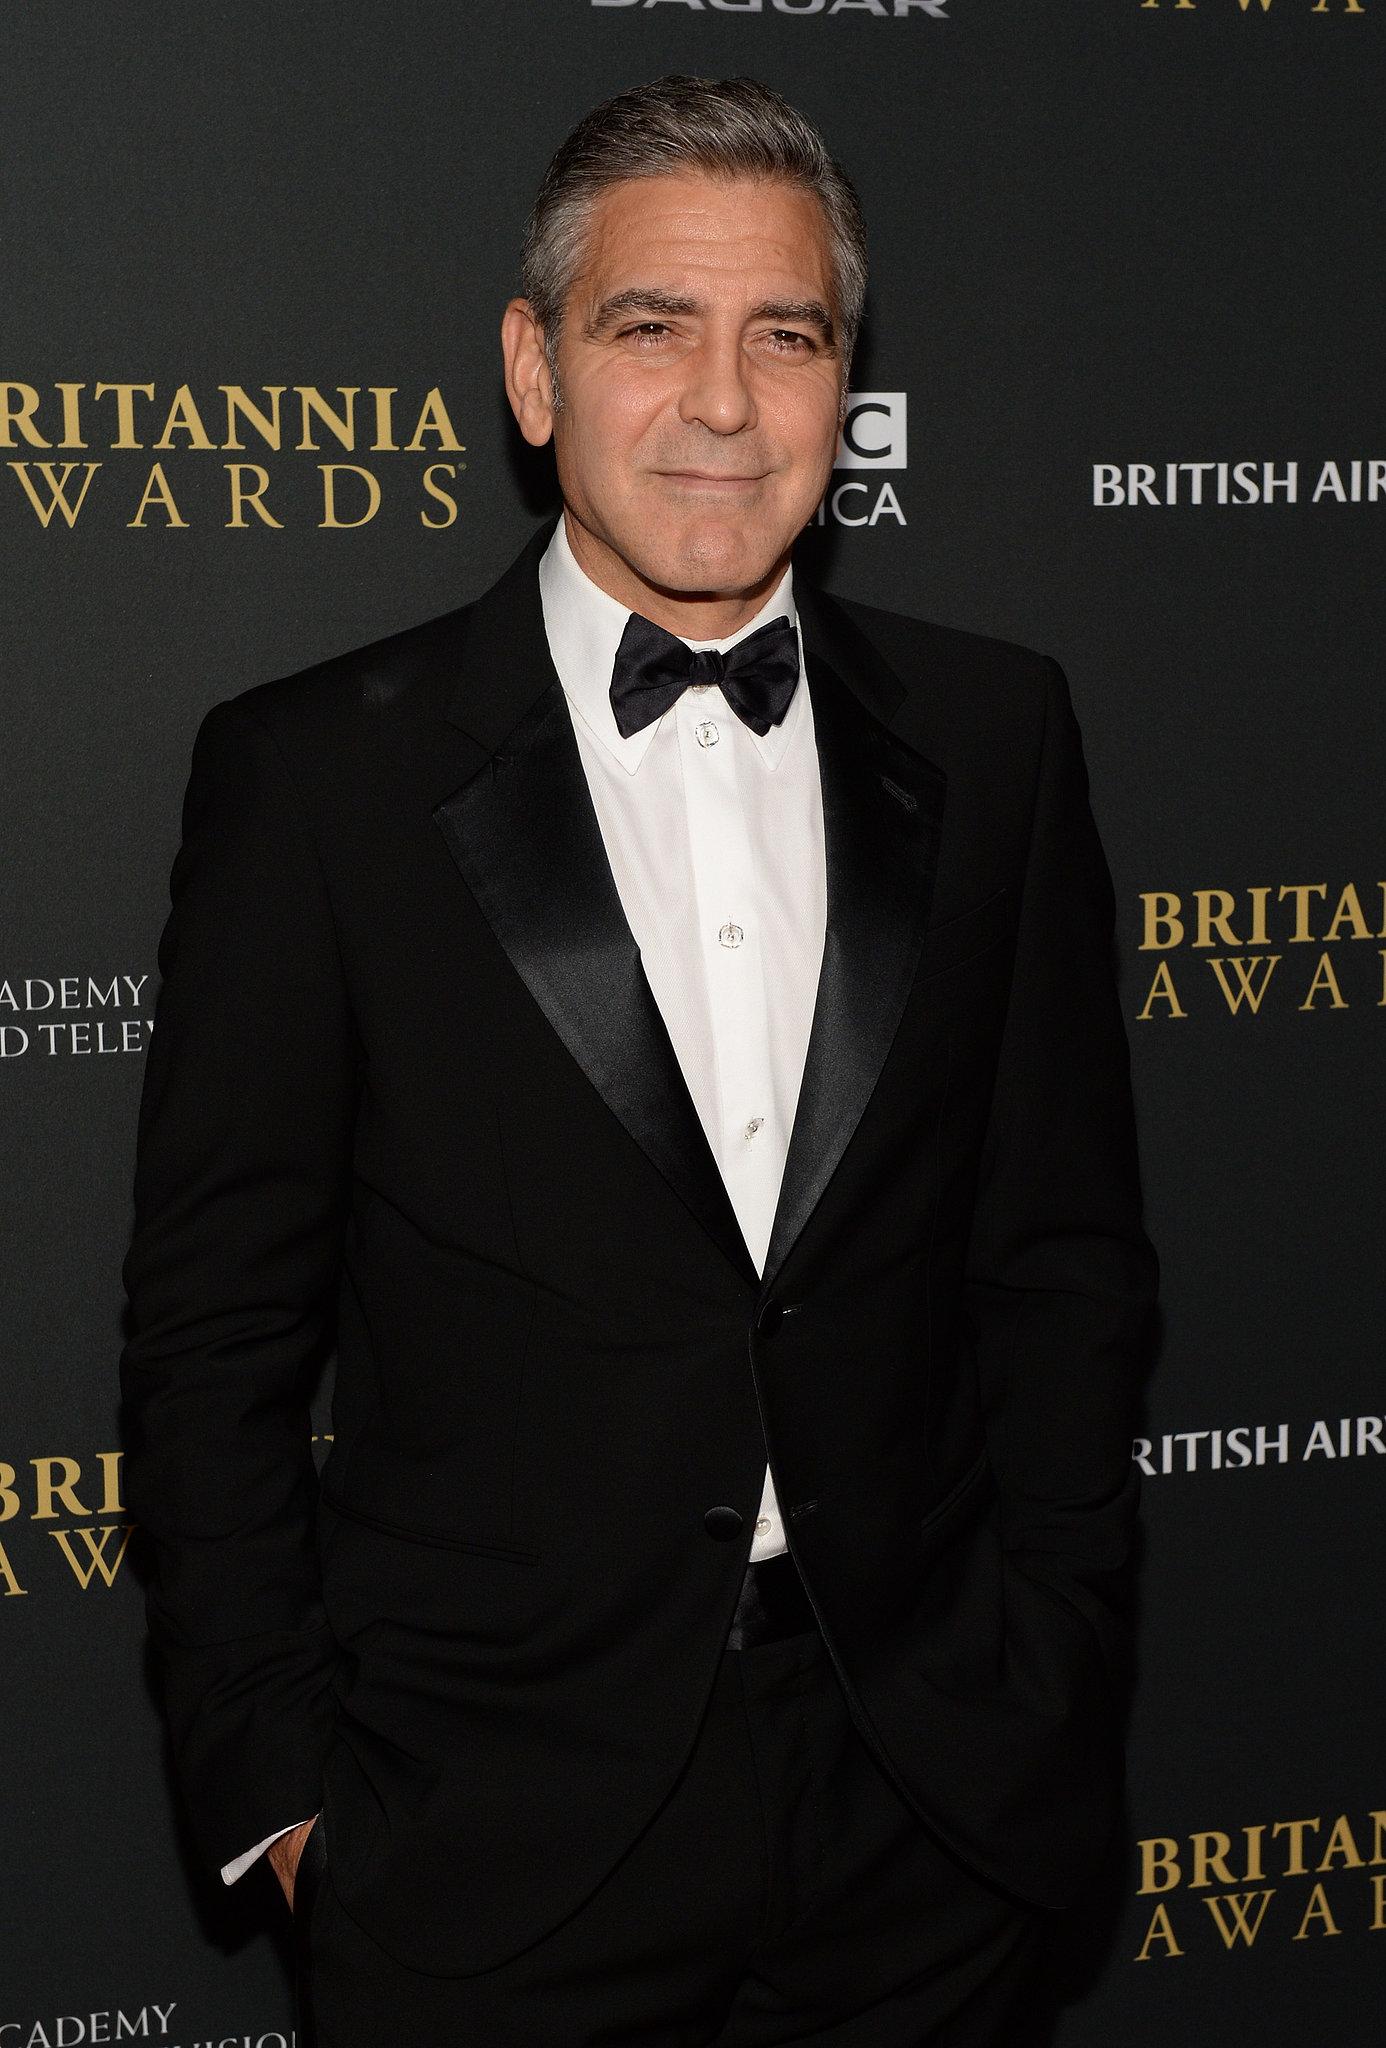 George Clooney suited up in a tuxedo at the BAFTA LA Jaguar Britannia Awards.